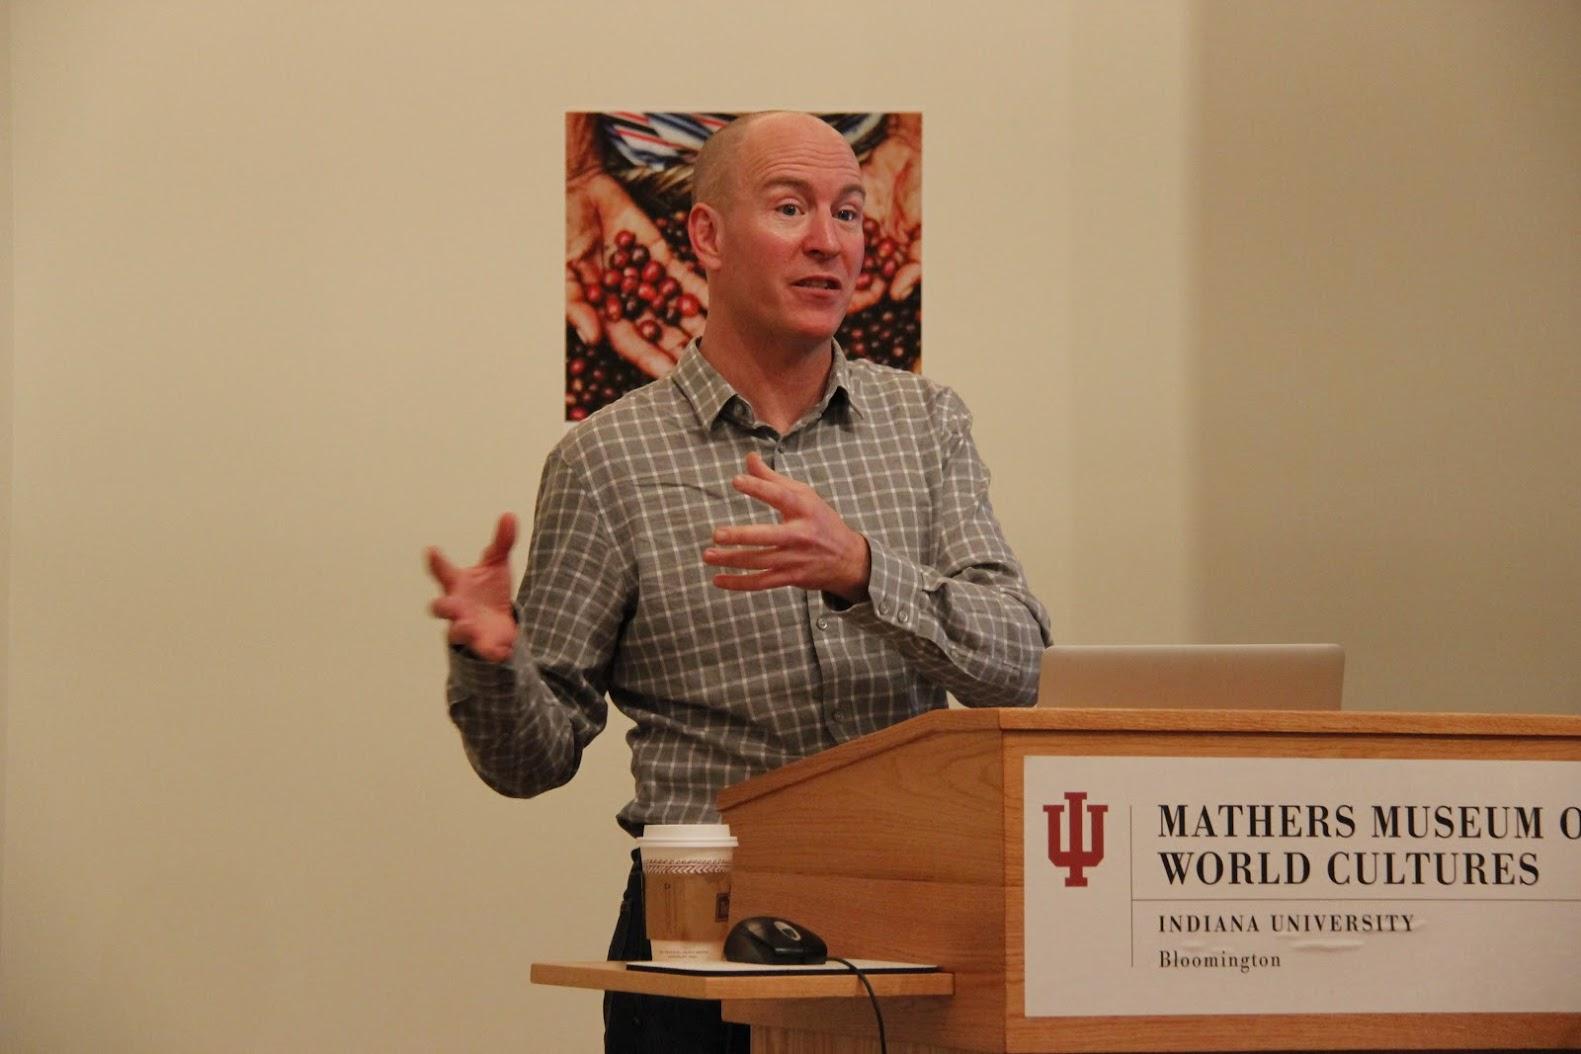 Adam Taub Lecture Presentation Mathers Museum of World Cultures IU